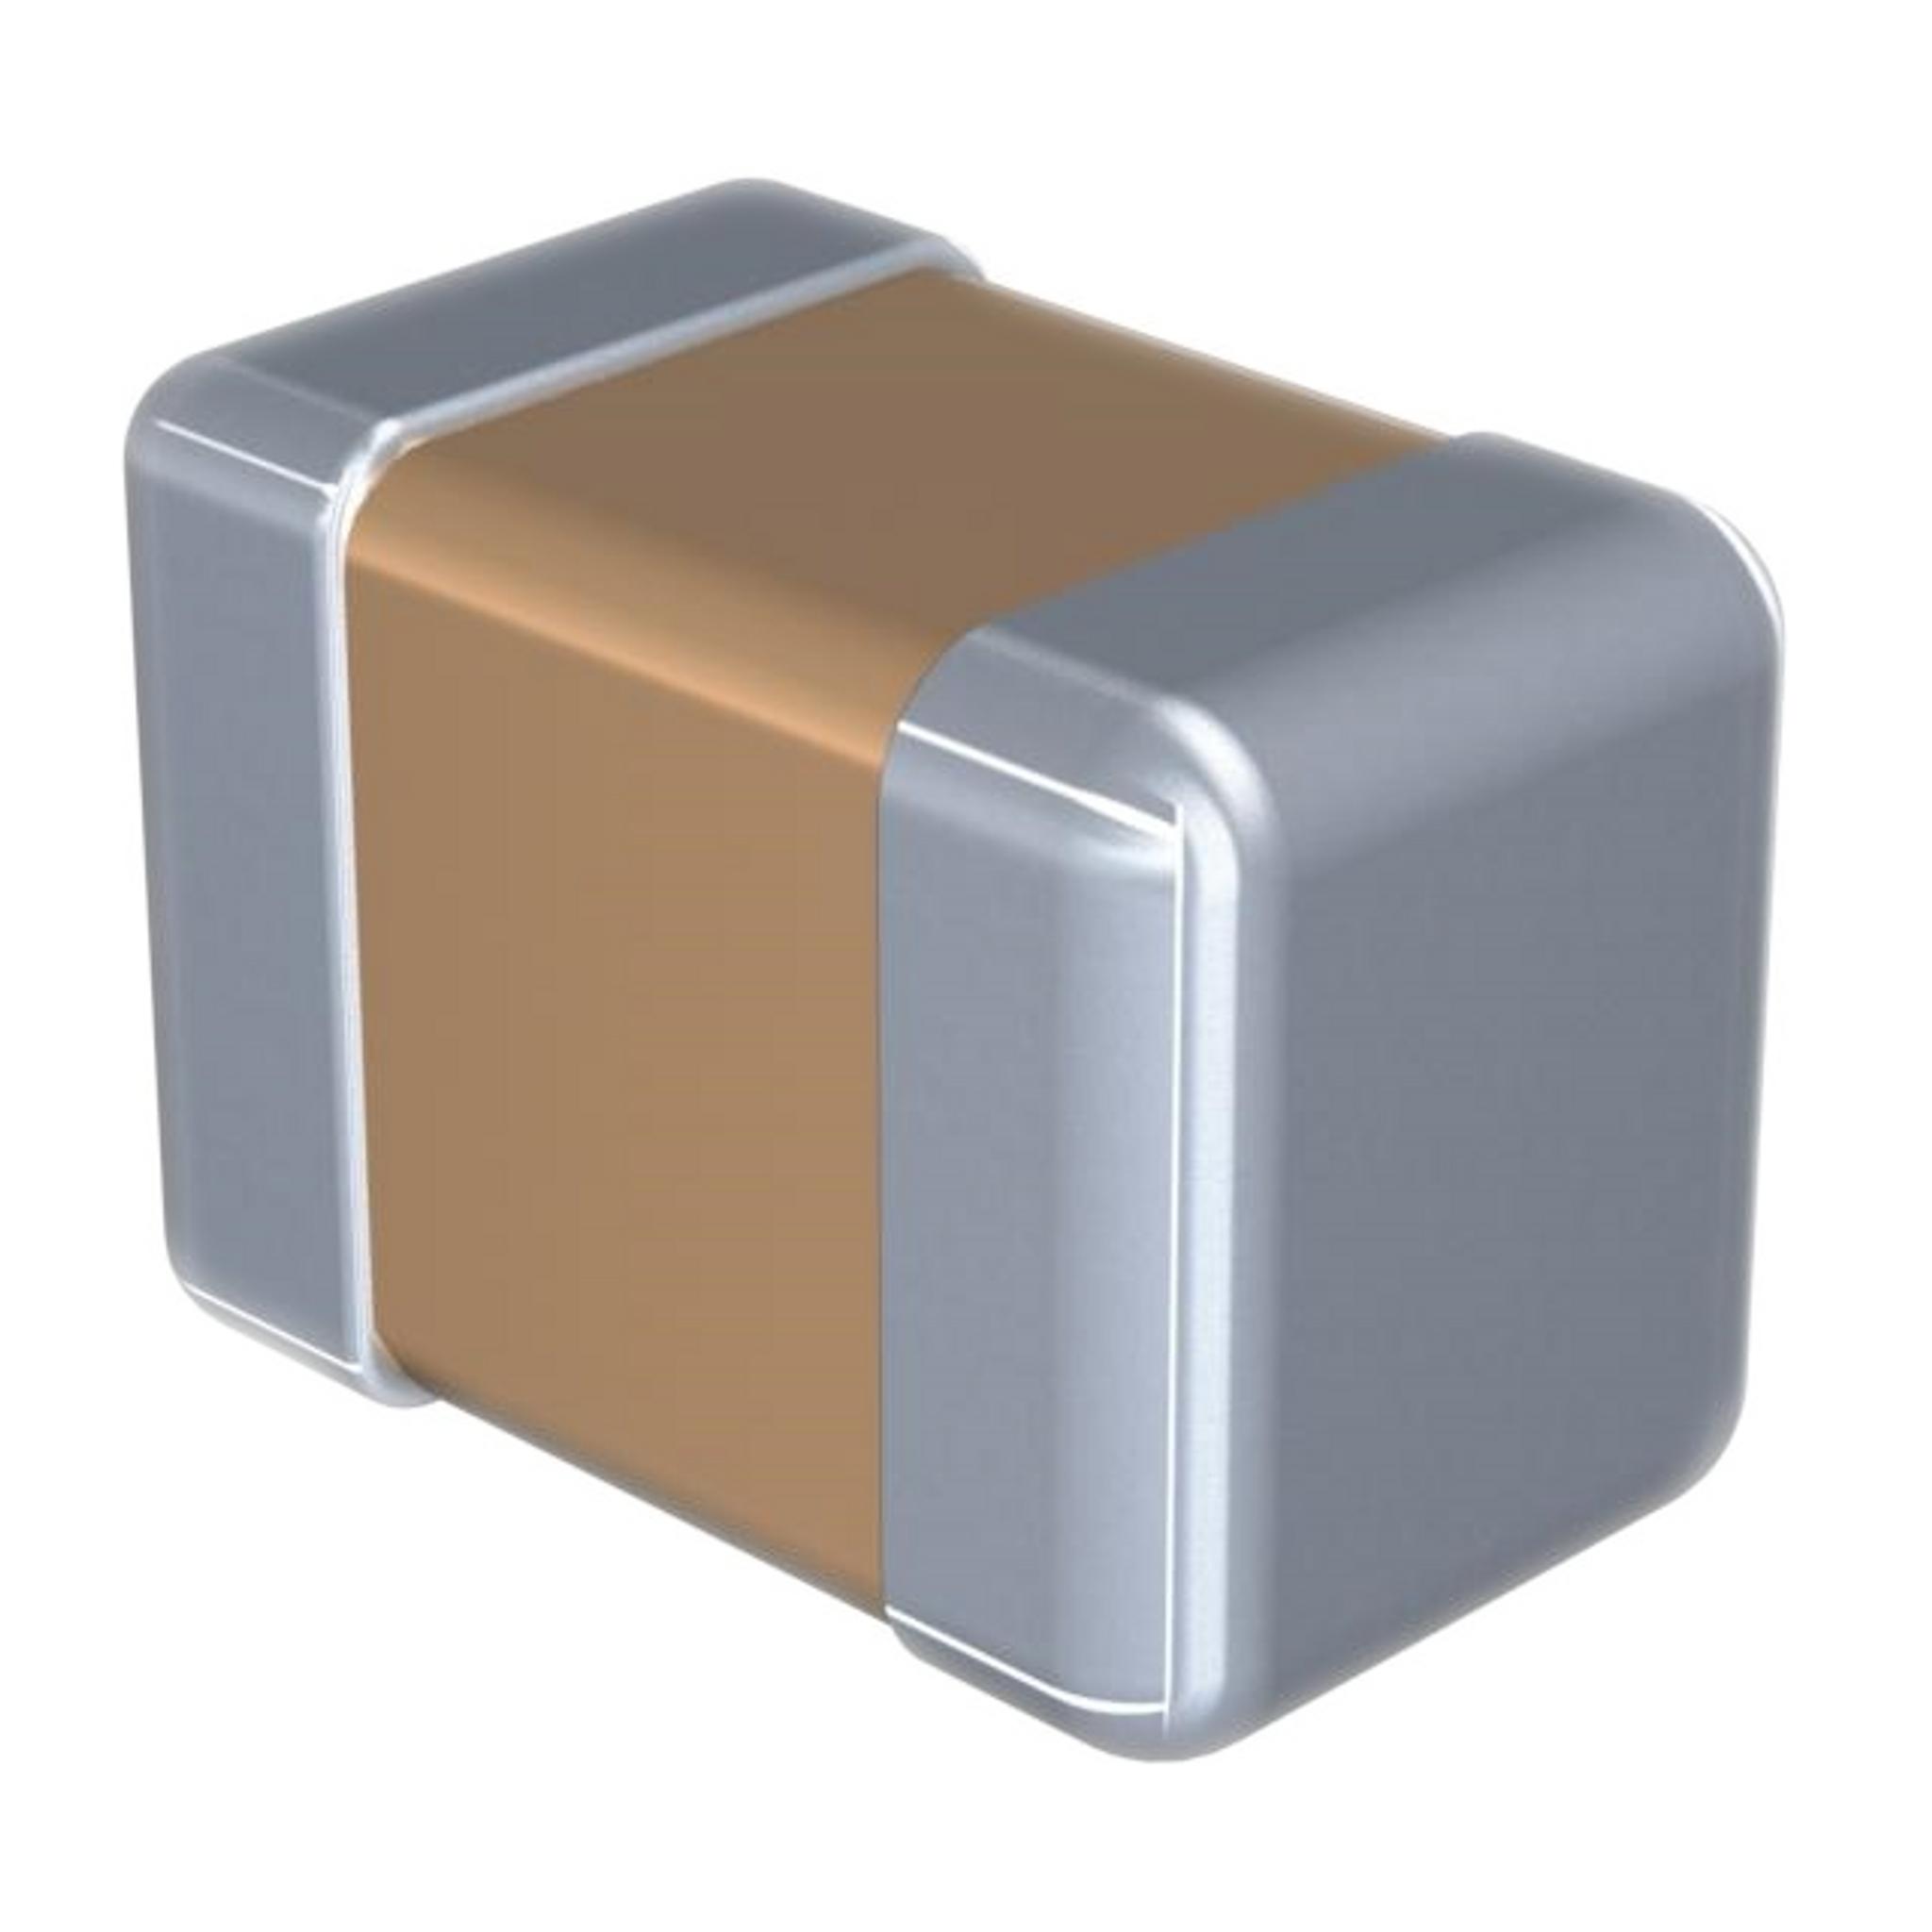 Pack of 10  CC0805KKX7R8BB474  YAGEO  Capacitor Ceramic 0.47uF 25V X7R 10/% Pad S